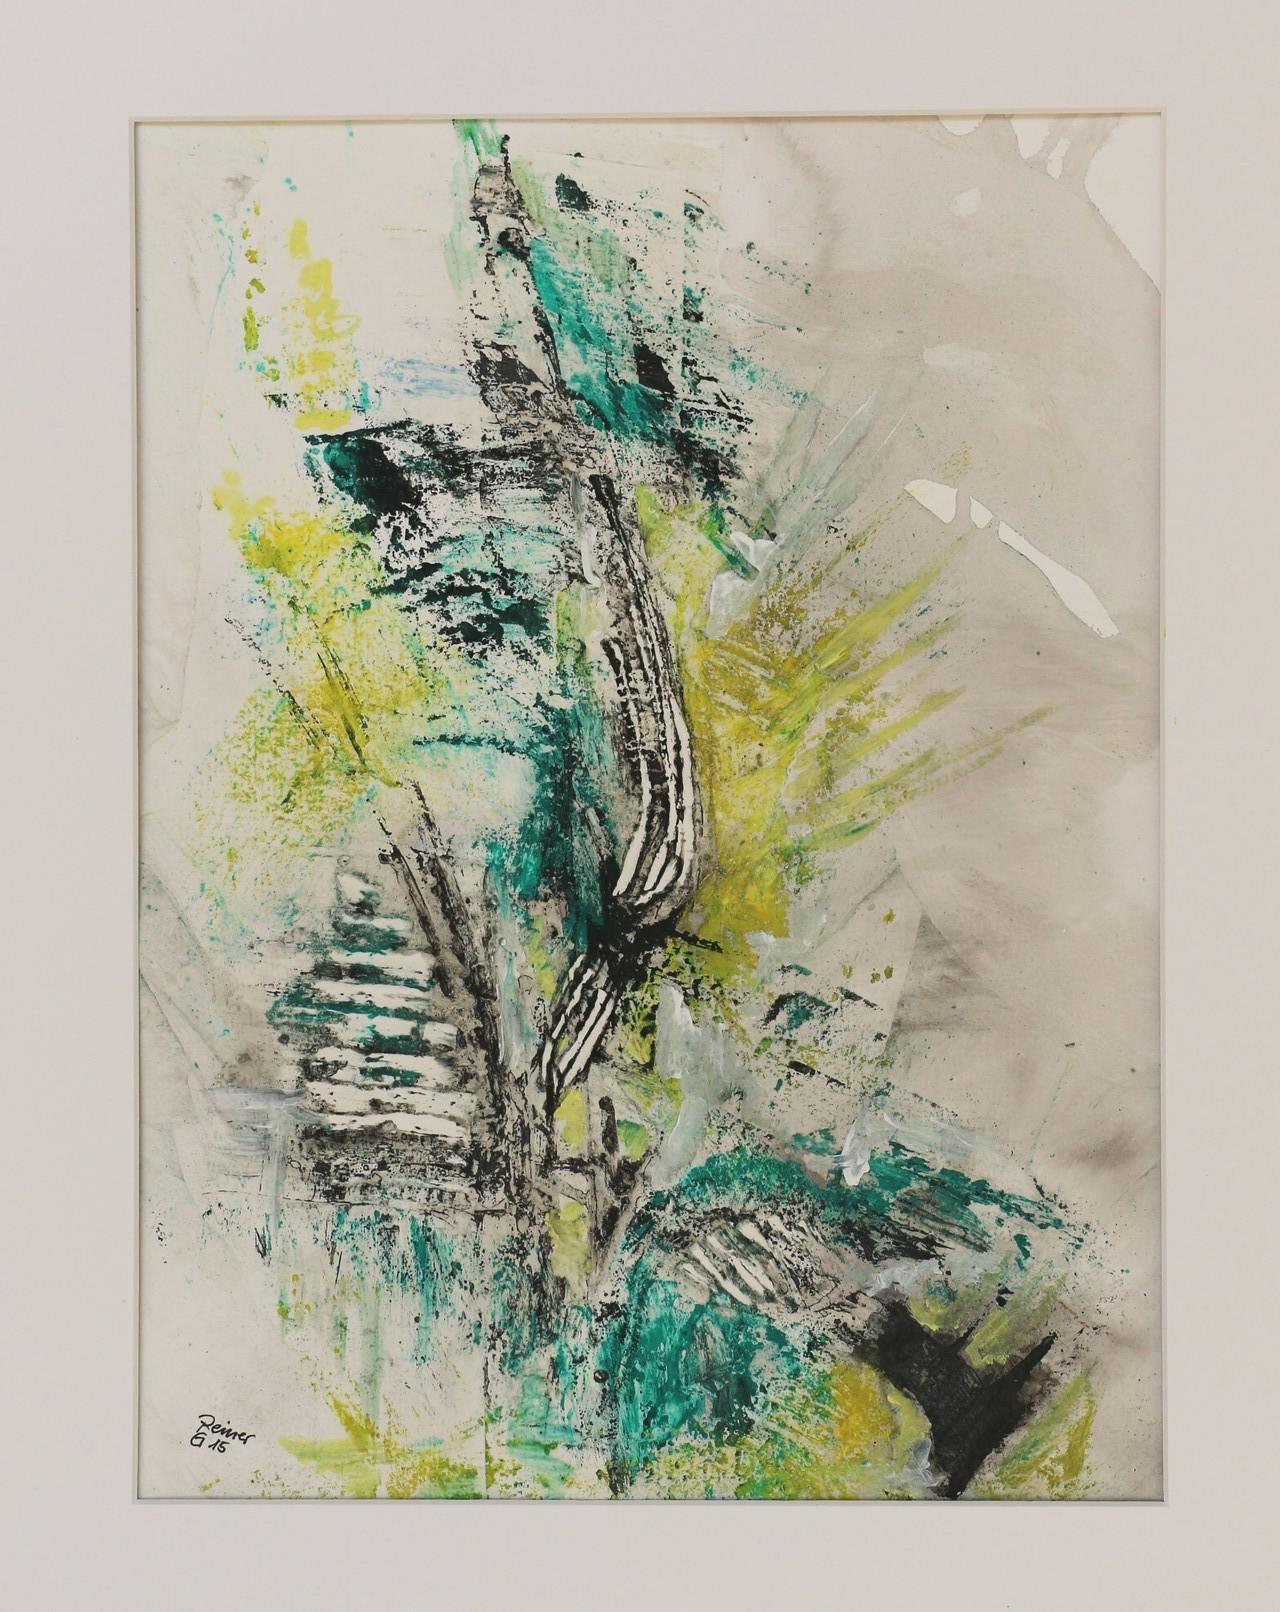 Etwas Grün 2, Acryl,Marmormehl,Öl auf Papier  50 x 40 cm